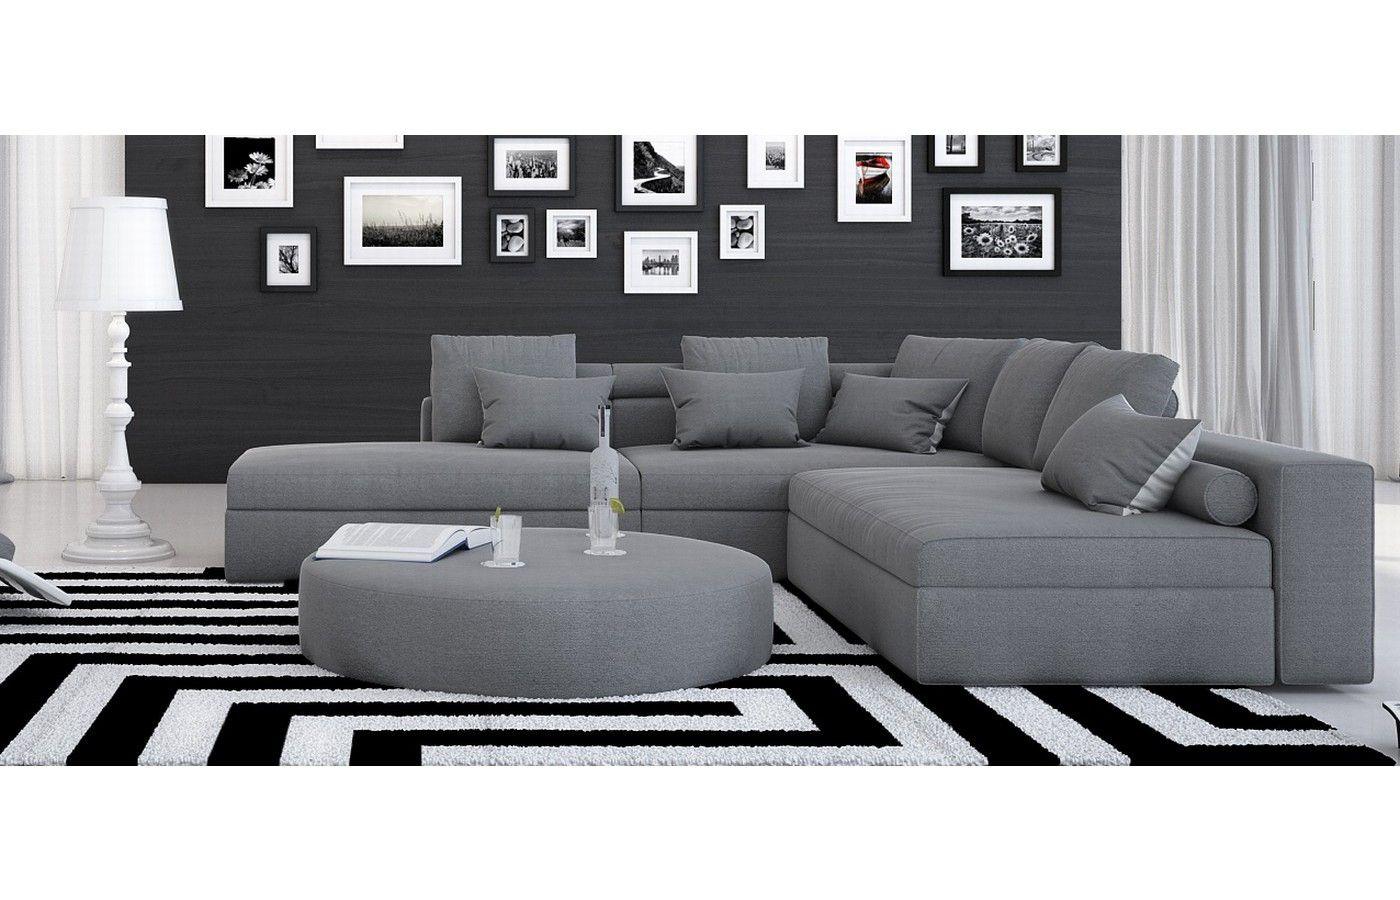 Ecksofa hellgrau  Stoffsofa ARI Ecksofa in grau | möbel | furniture | Pinterest ...